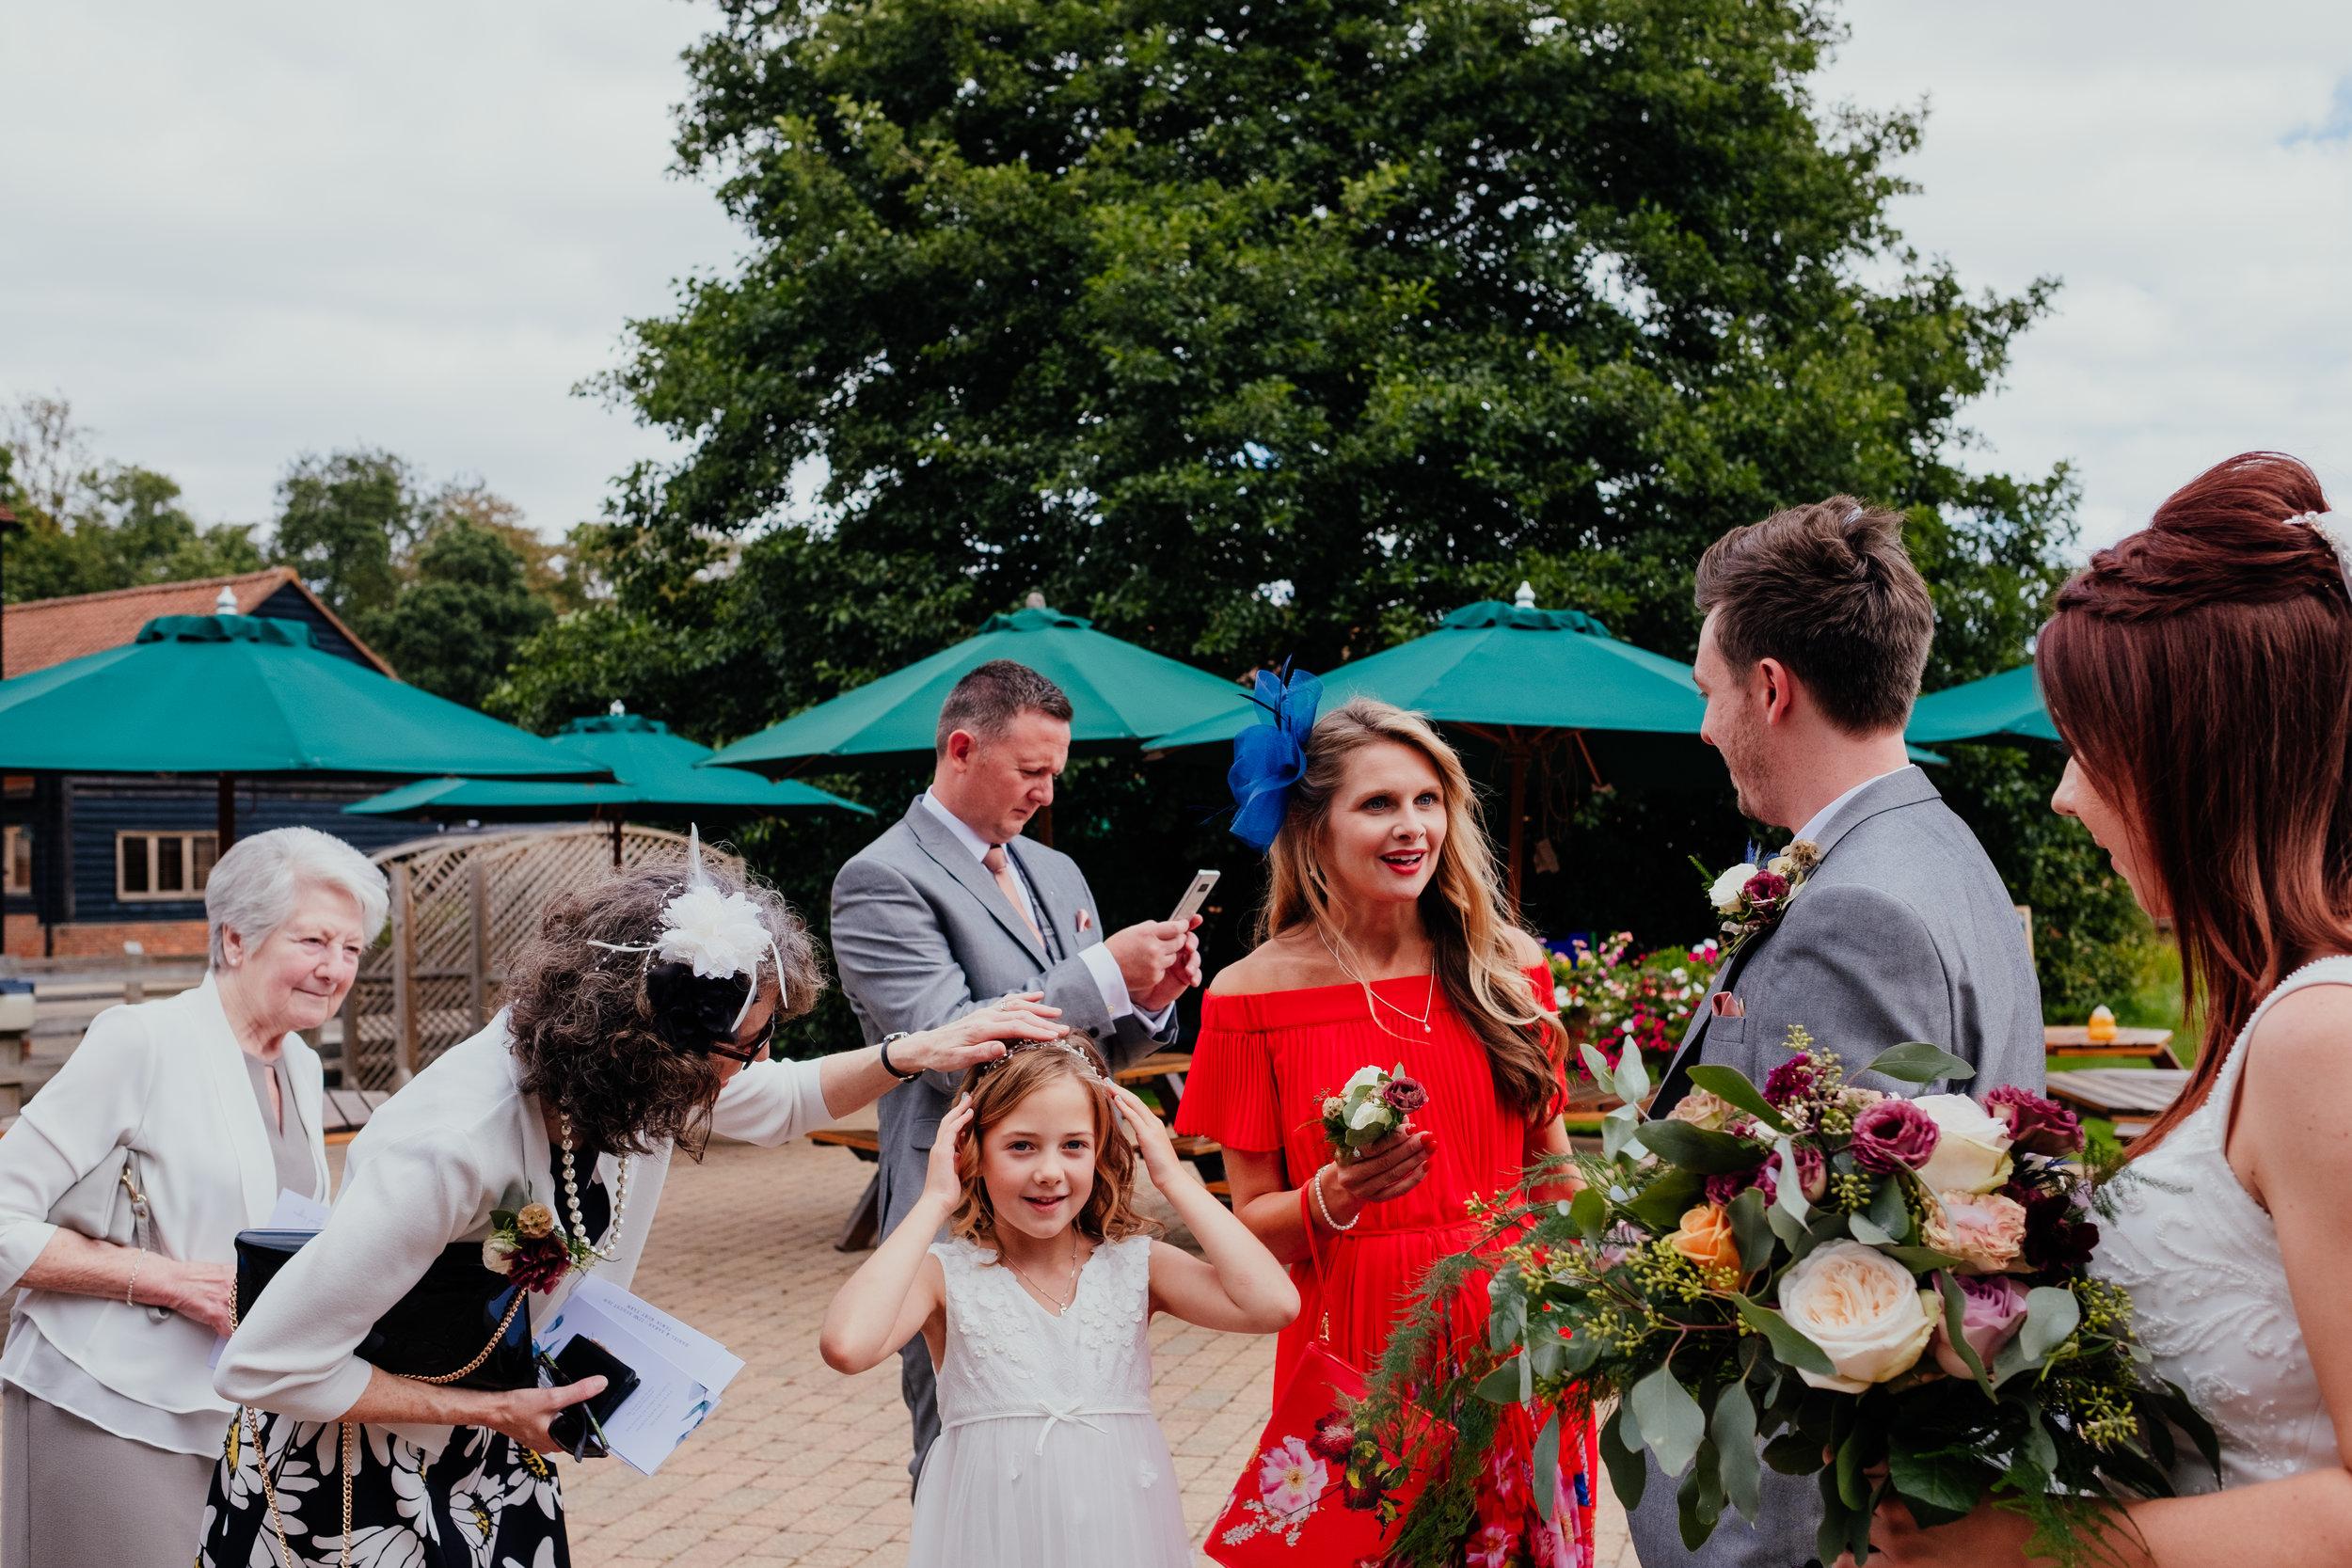 Wedding guests at Tewin Bury Farm